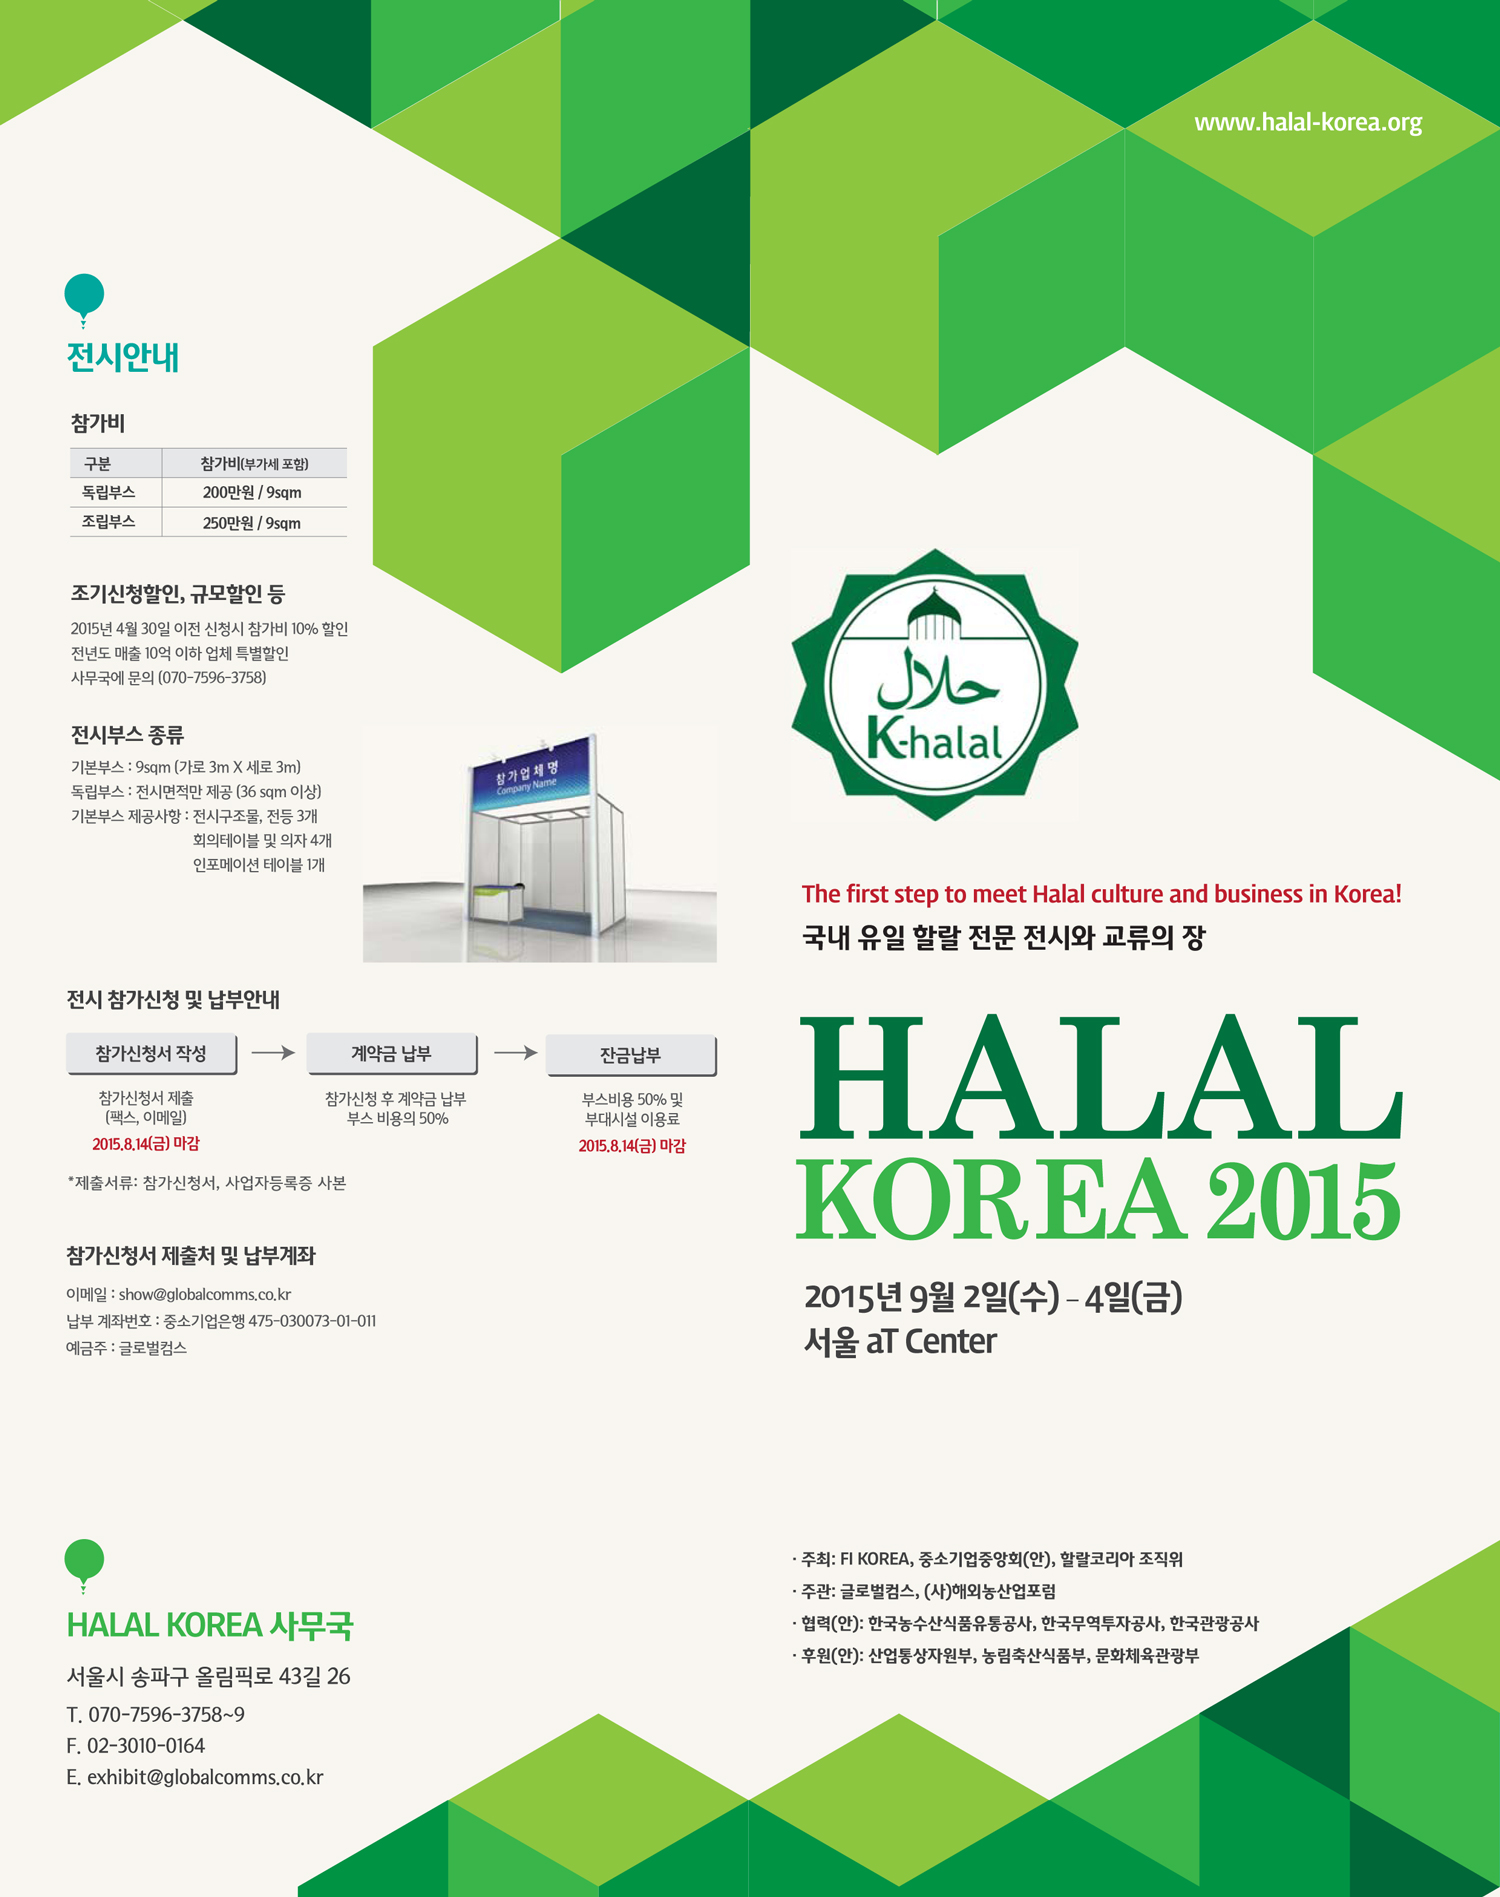 Halal-Korea-Expo-2015_Kor_01